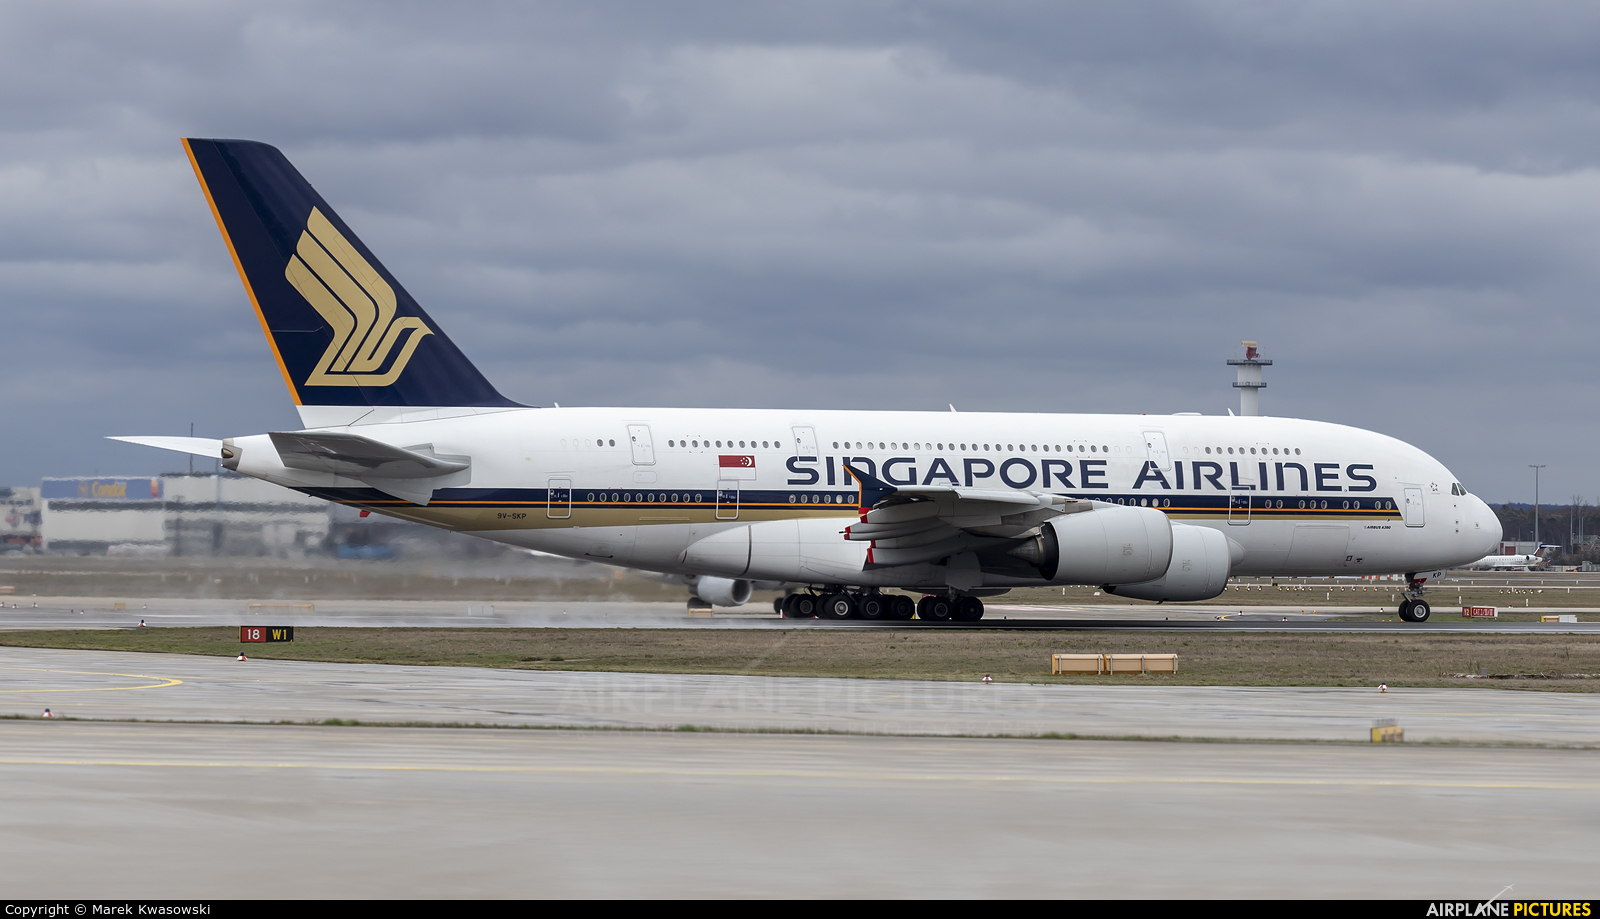 Singapore Airlines 9V-SKP aircraft at Frankfurt